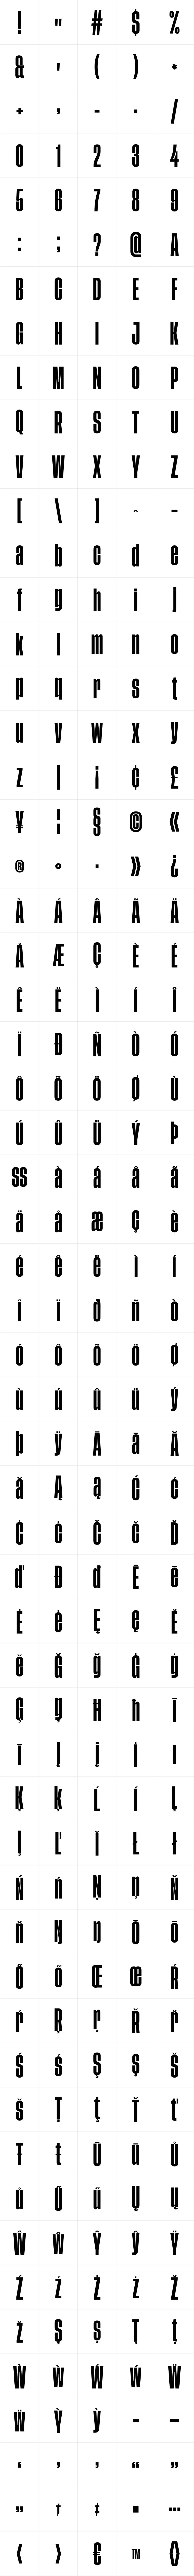 Tusker Grotesk 3700 Bold